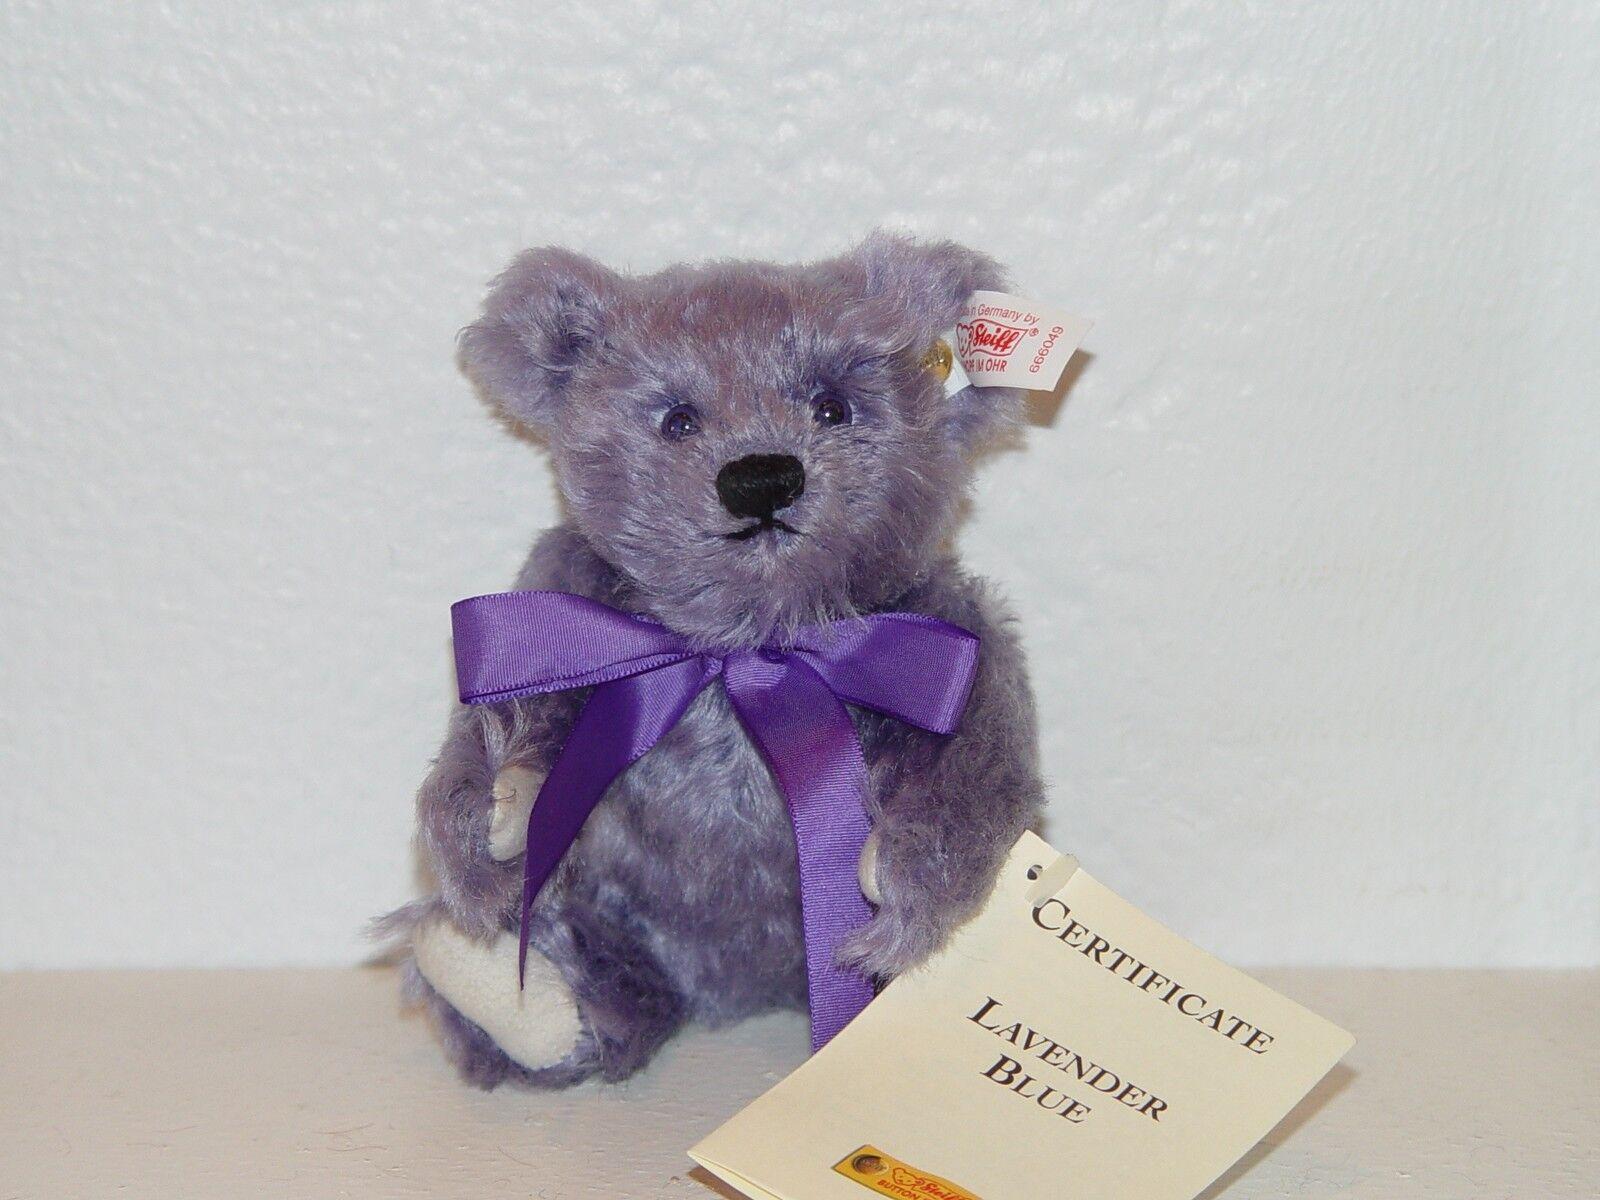 Steiff MINI LAVENDER blu Teddy Bear EAN 666049 MOHAIR 6.29 inches (16cm) - NEW